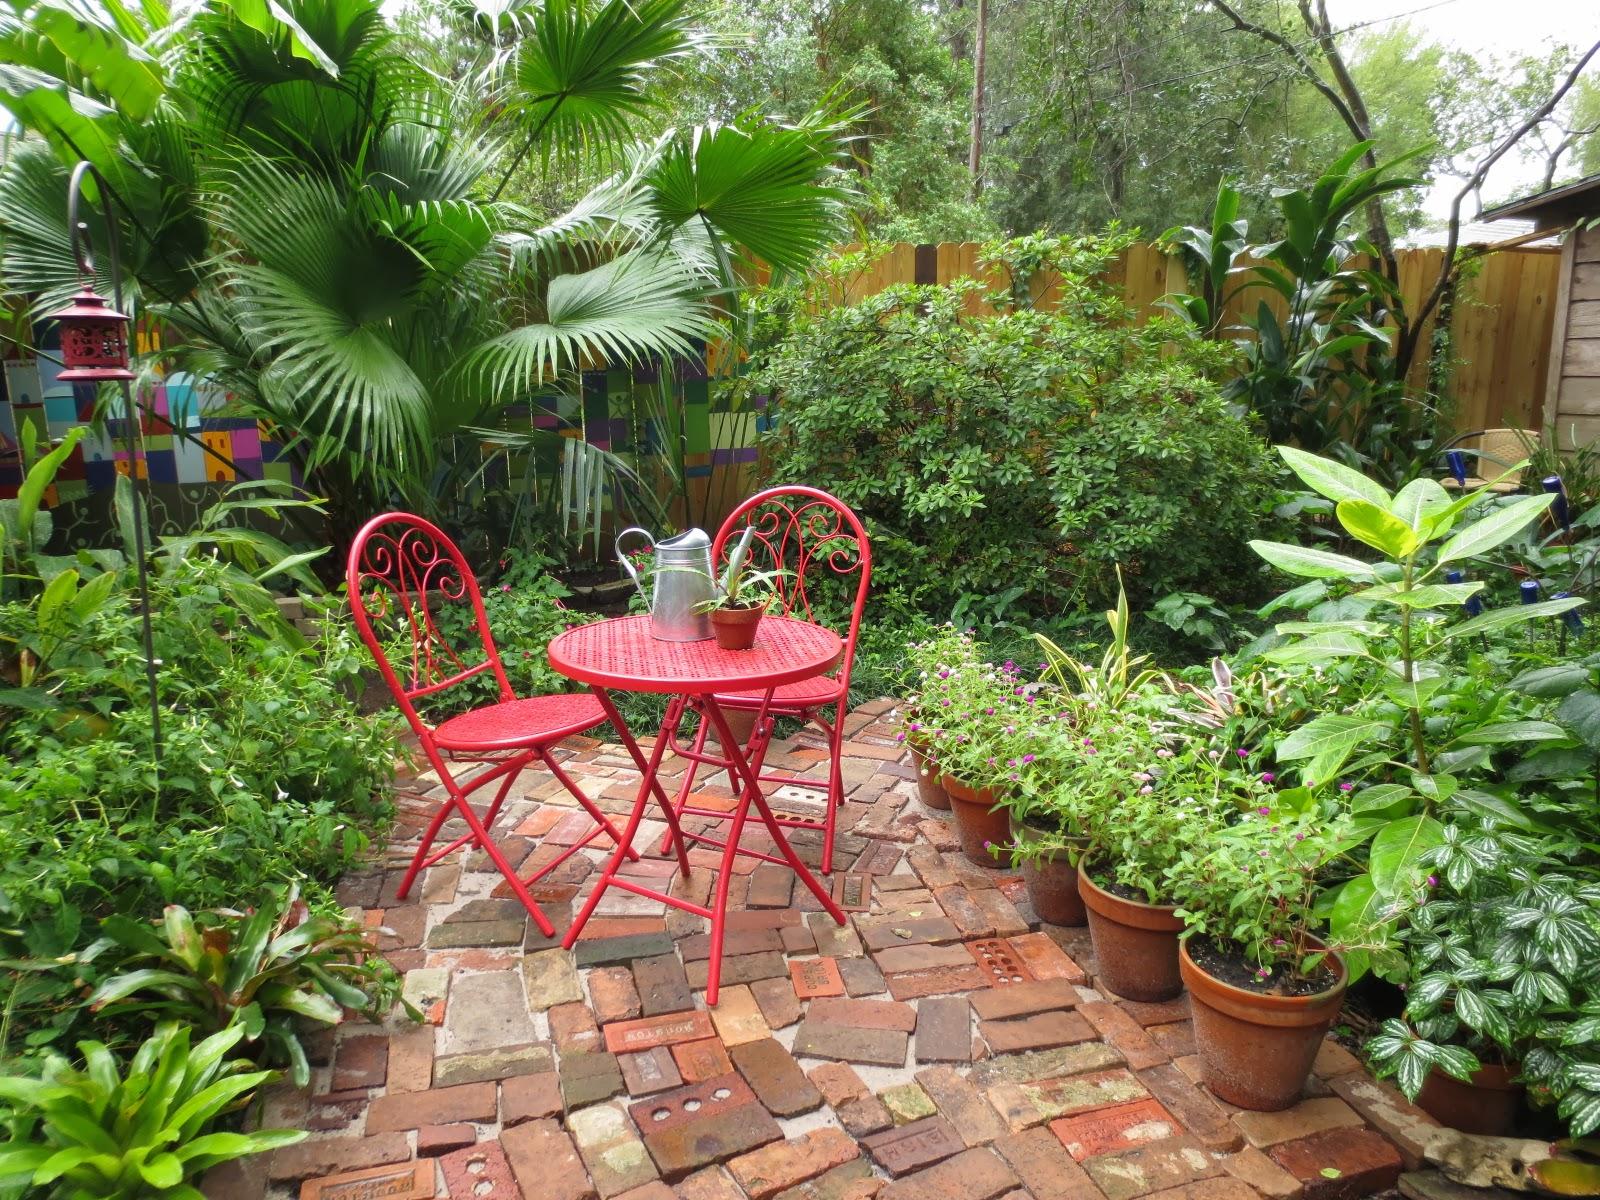 Tropical texana antique brick courtyard comes to life for 10 plants for courtyard gardens design